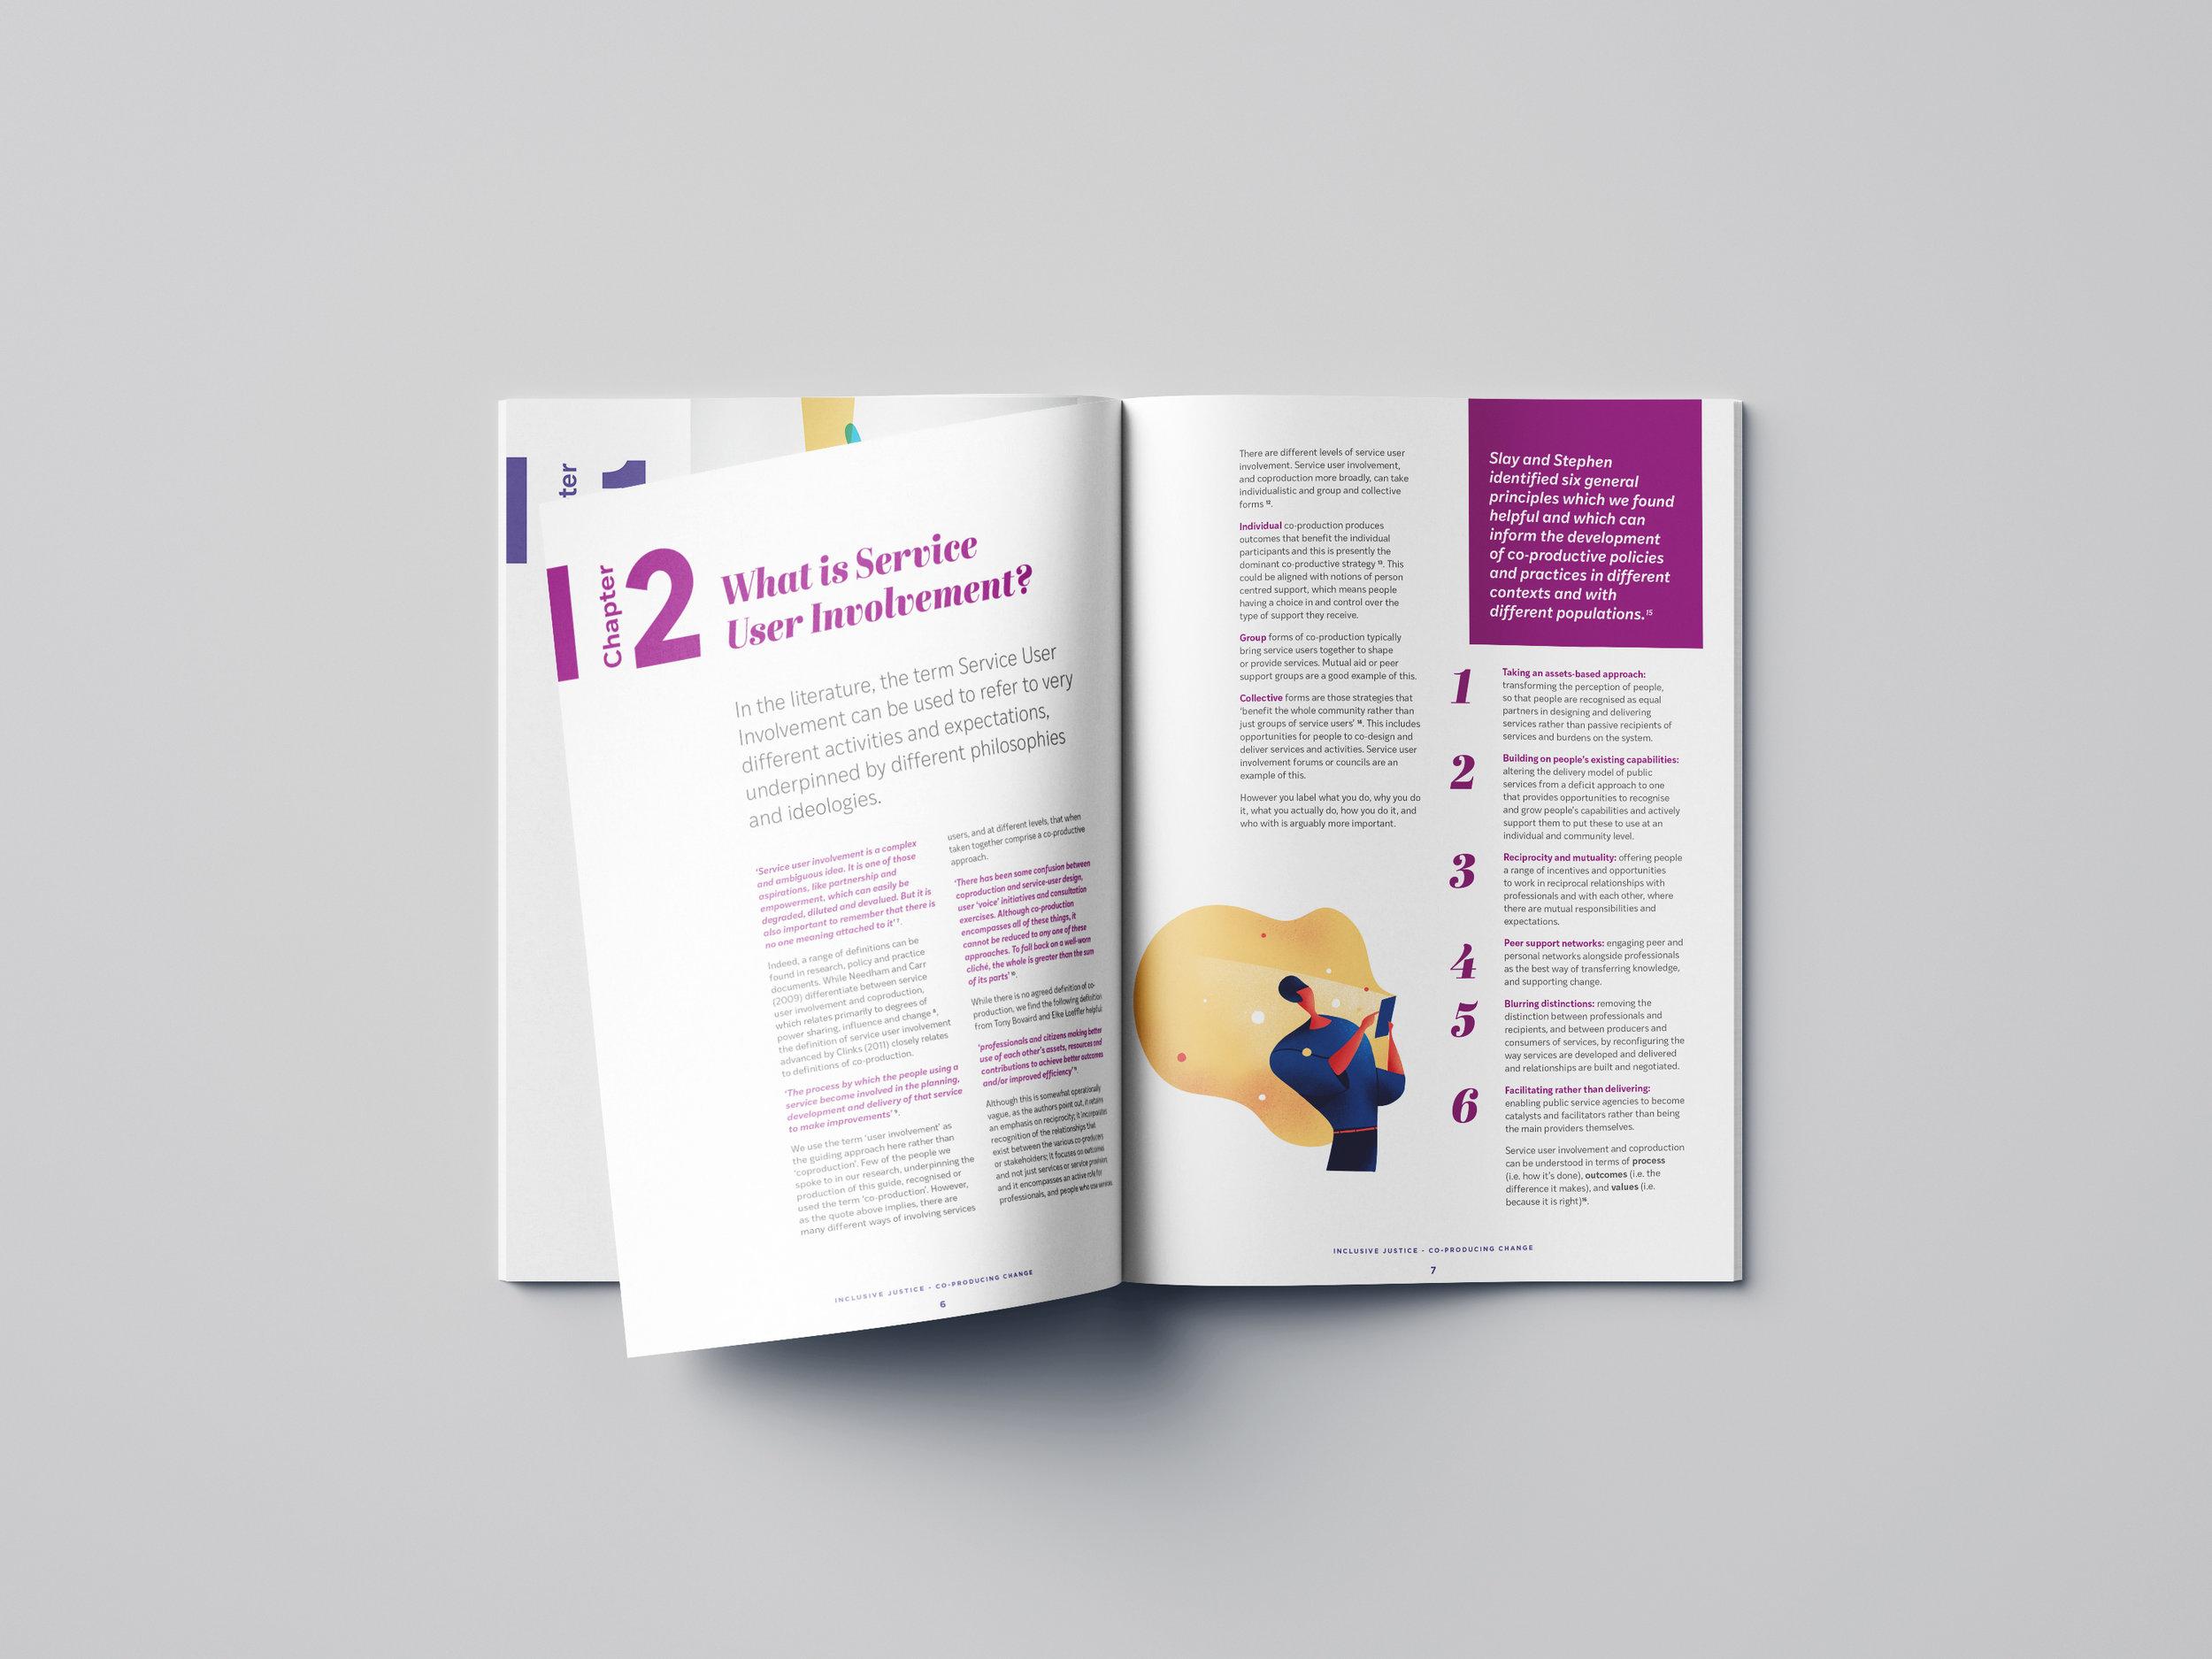 StrathclydeUni_brochure4.jpg